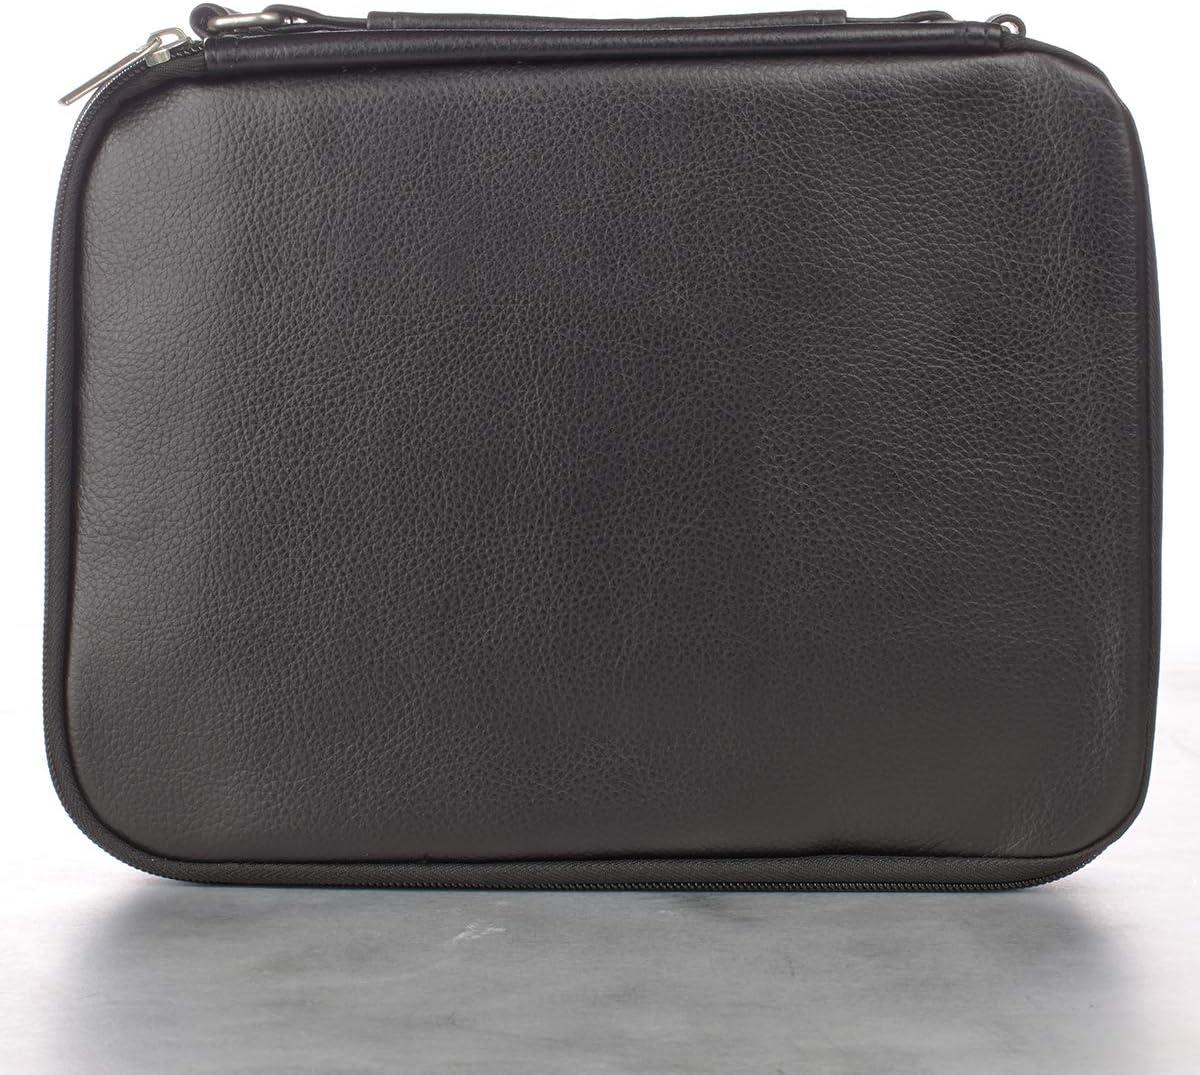 Two-Fold Luxleather Organizer Blk XL